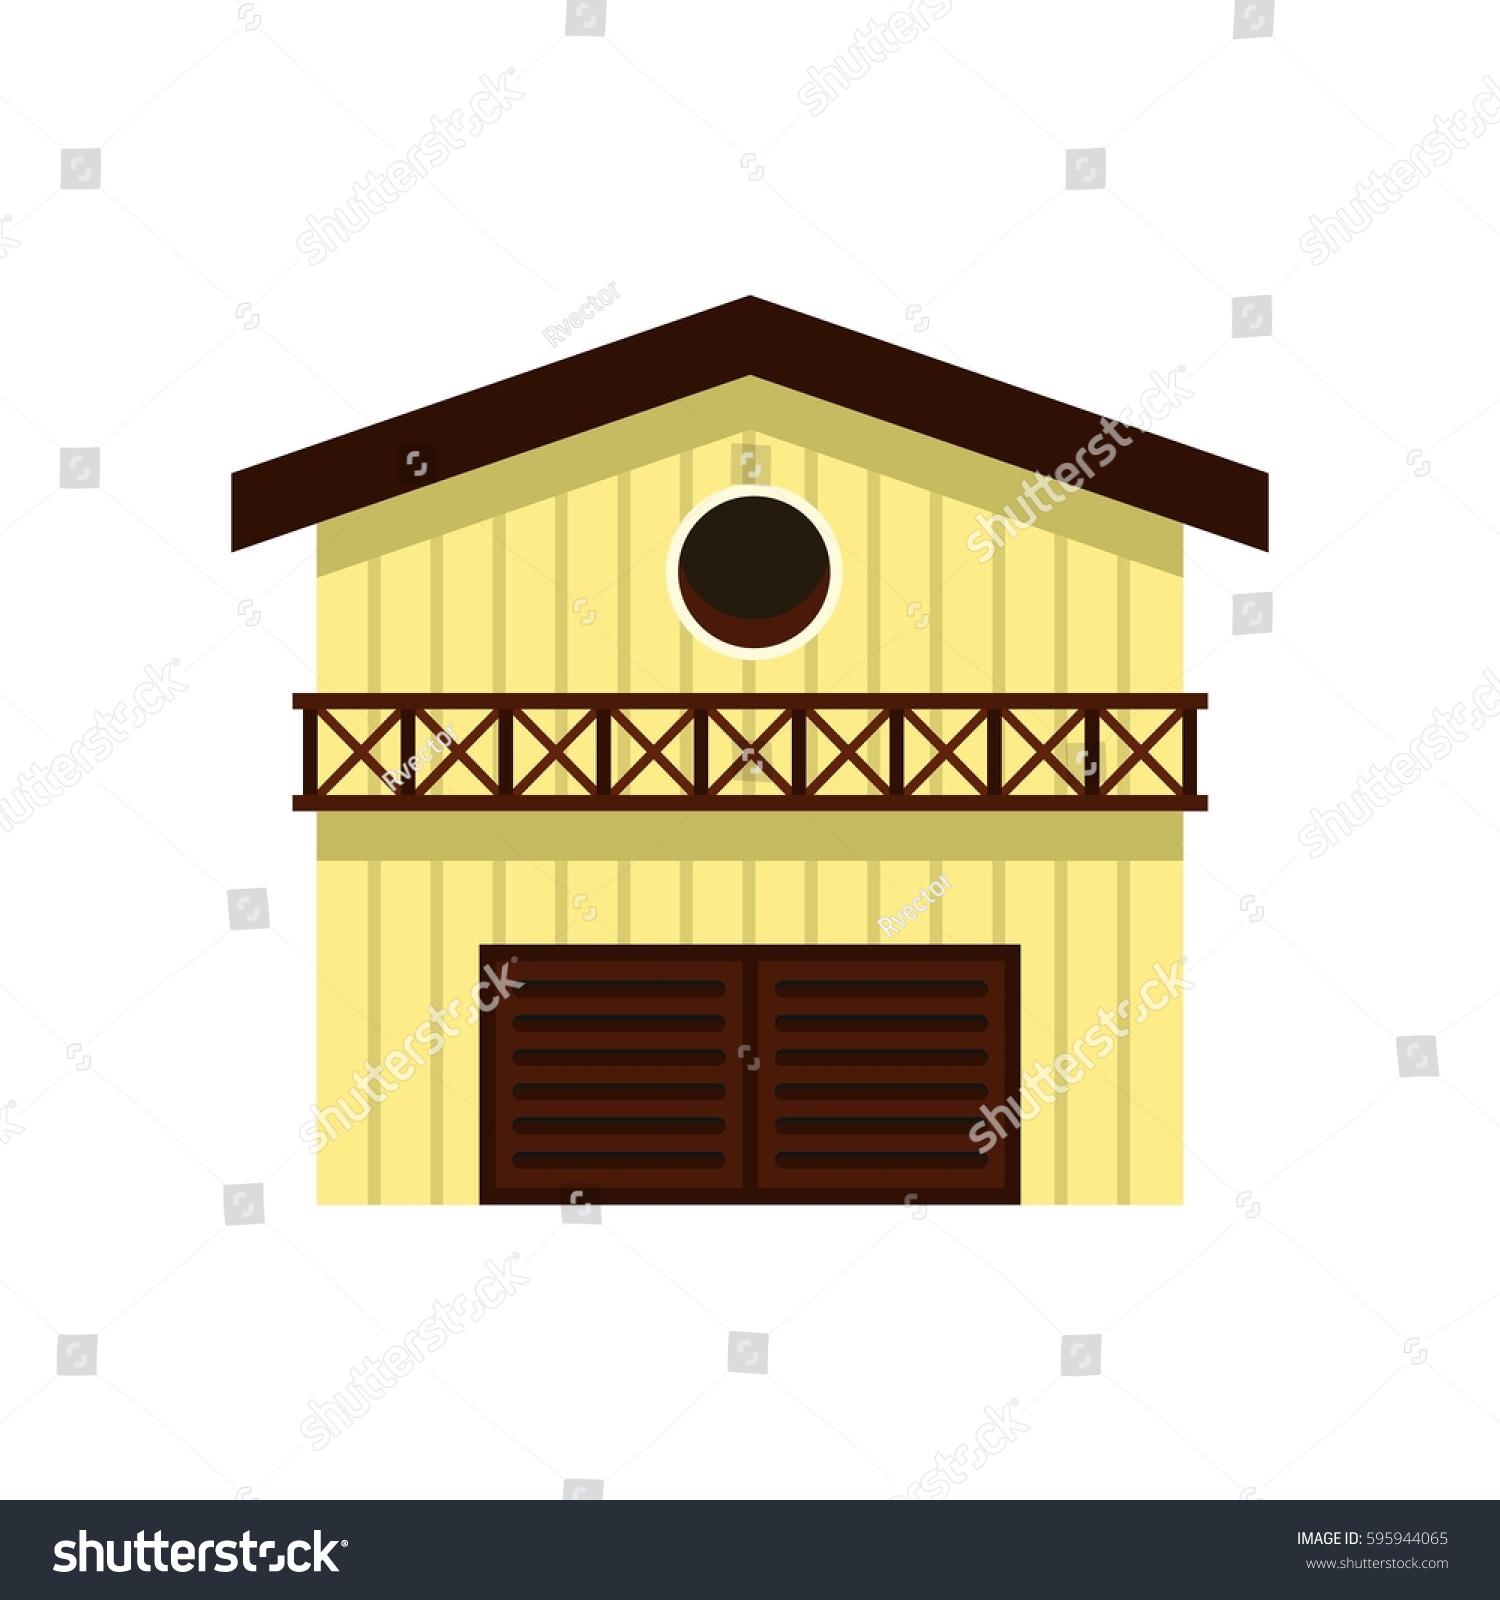 Barn Animals Icon Flat Style Isolated Stock Vector 595944065